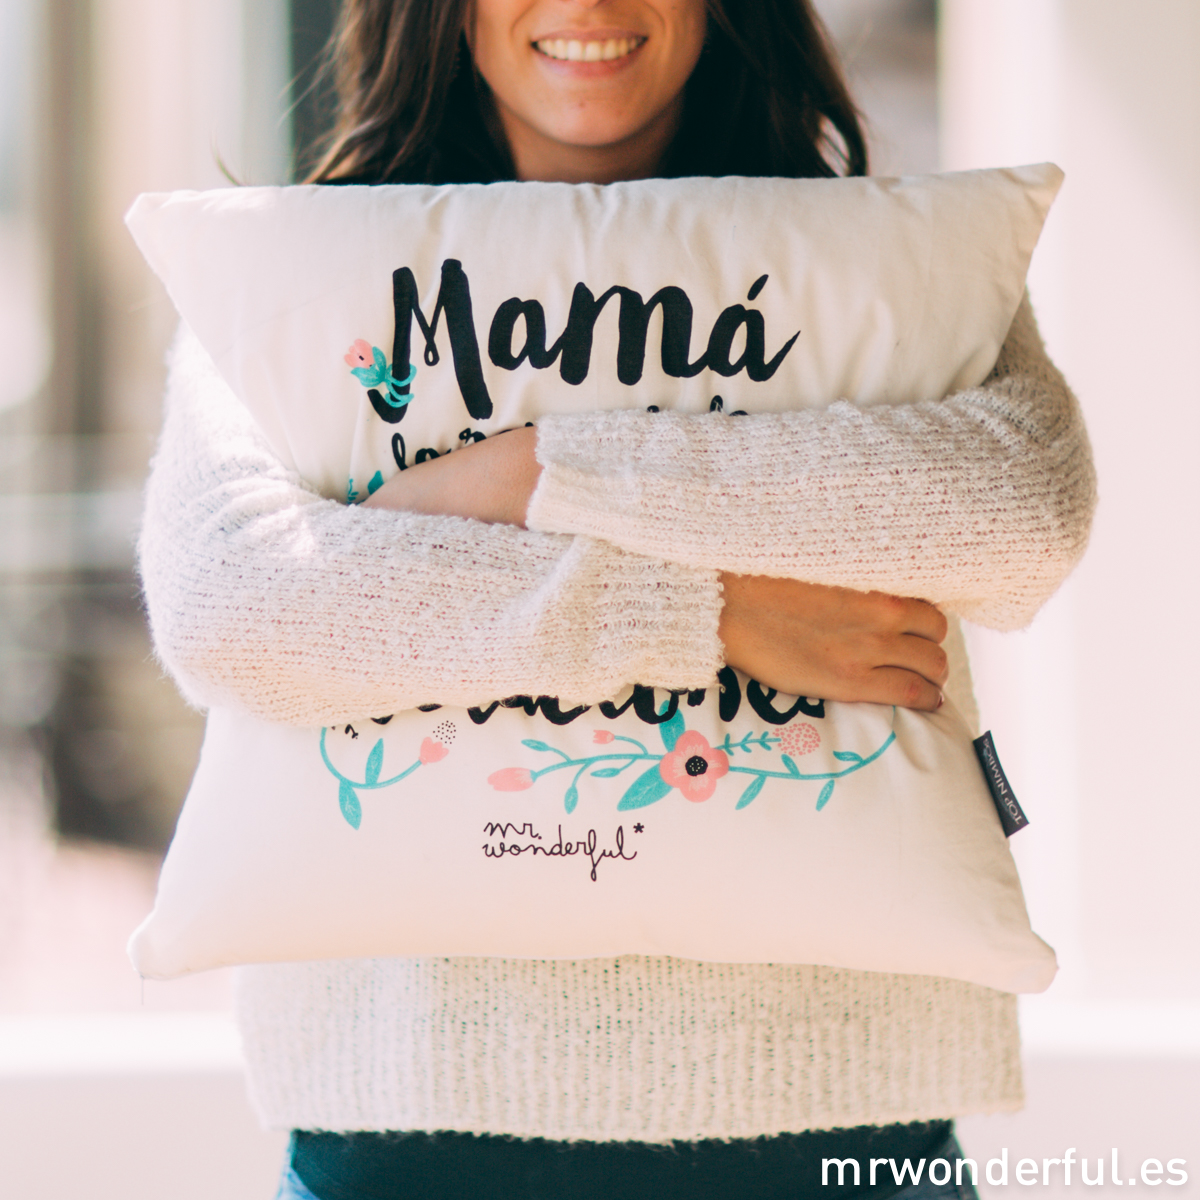 mrwonderful_teaser_dia-madre_2015-17